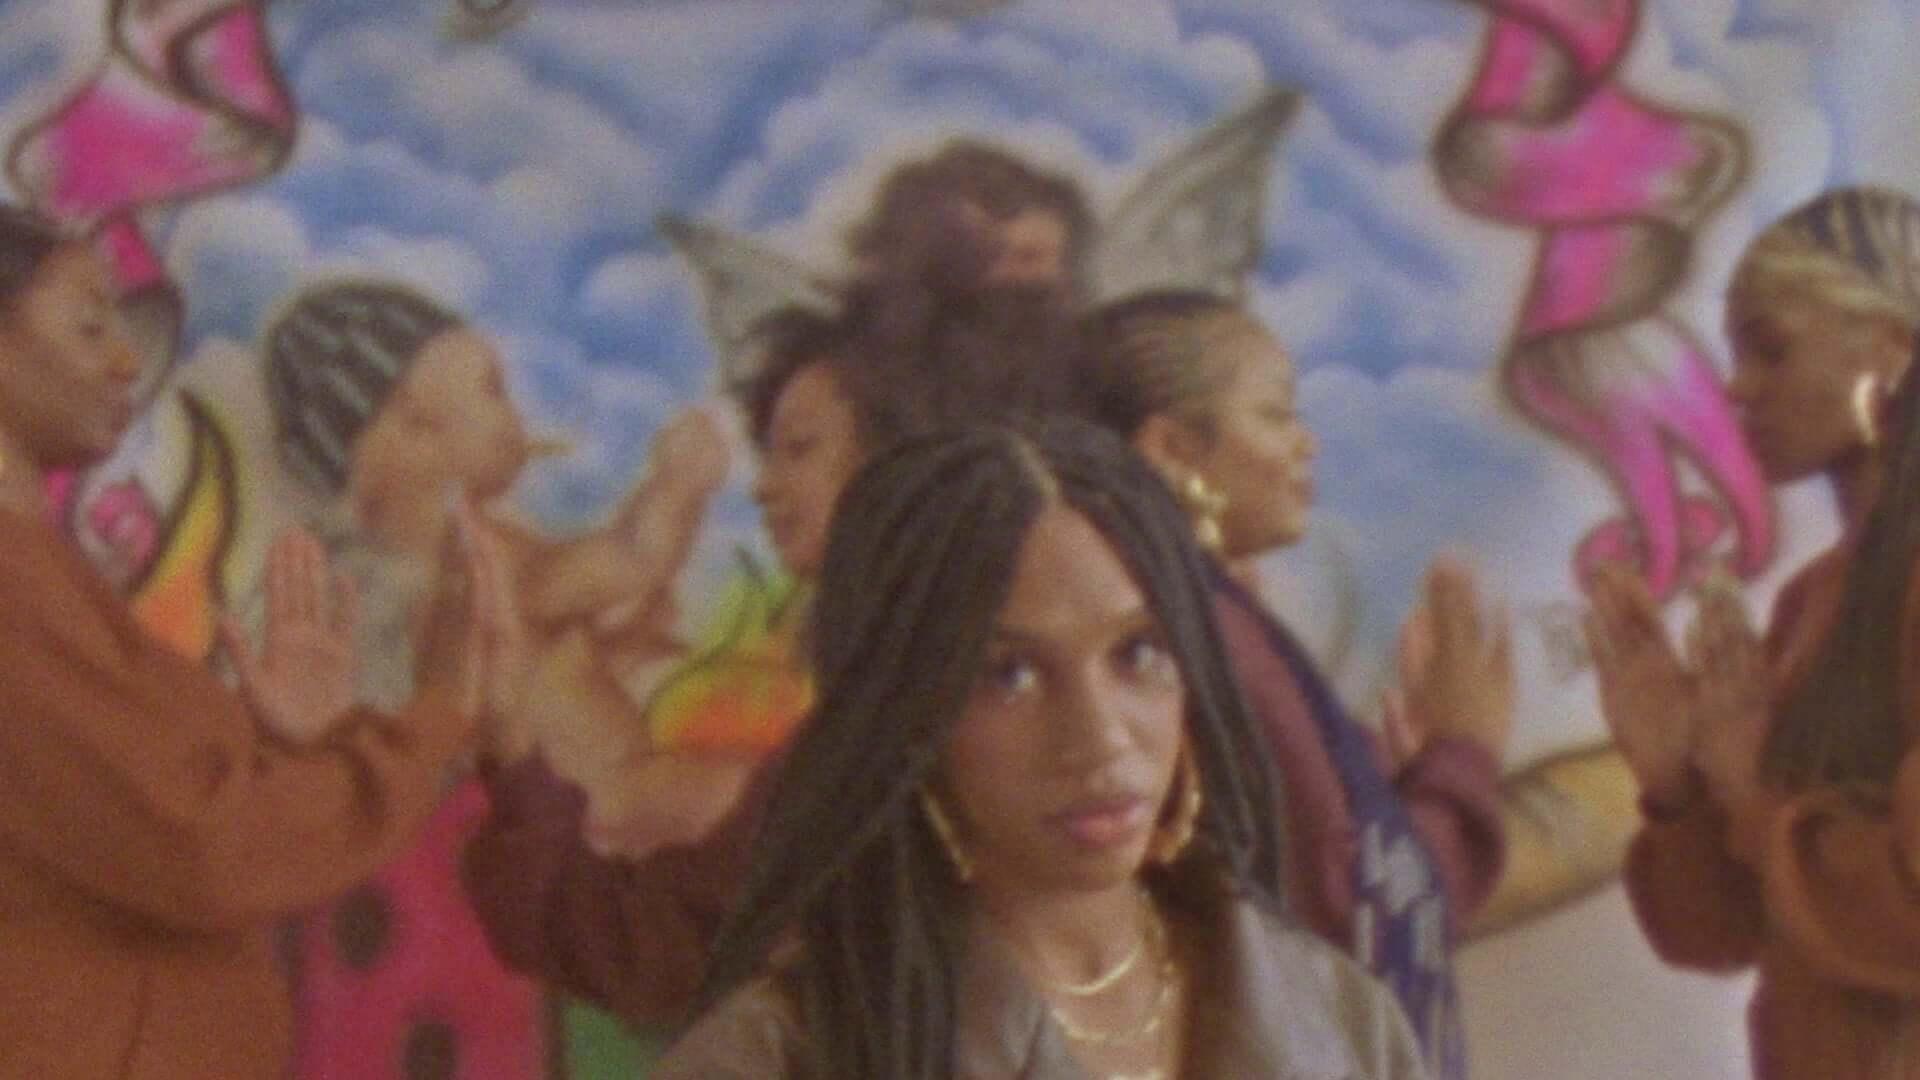 "〈Big Dada〉再始動後のリリース第1弾!Yaya Bey最新EP『The Things I Can't Take With Me』が発売決定&新曲""fxck it then""MVも公開 music210226_yaya-bey_1-1920x1080"